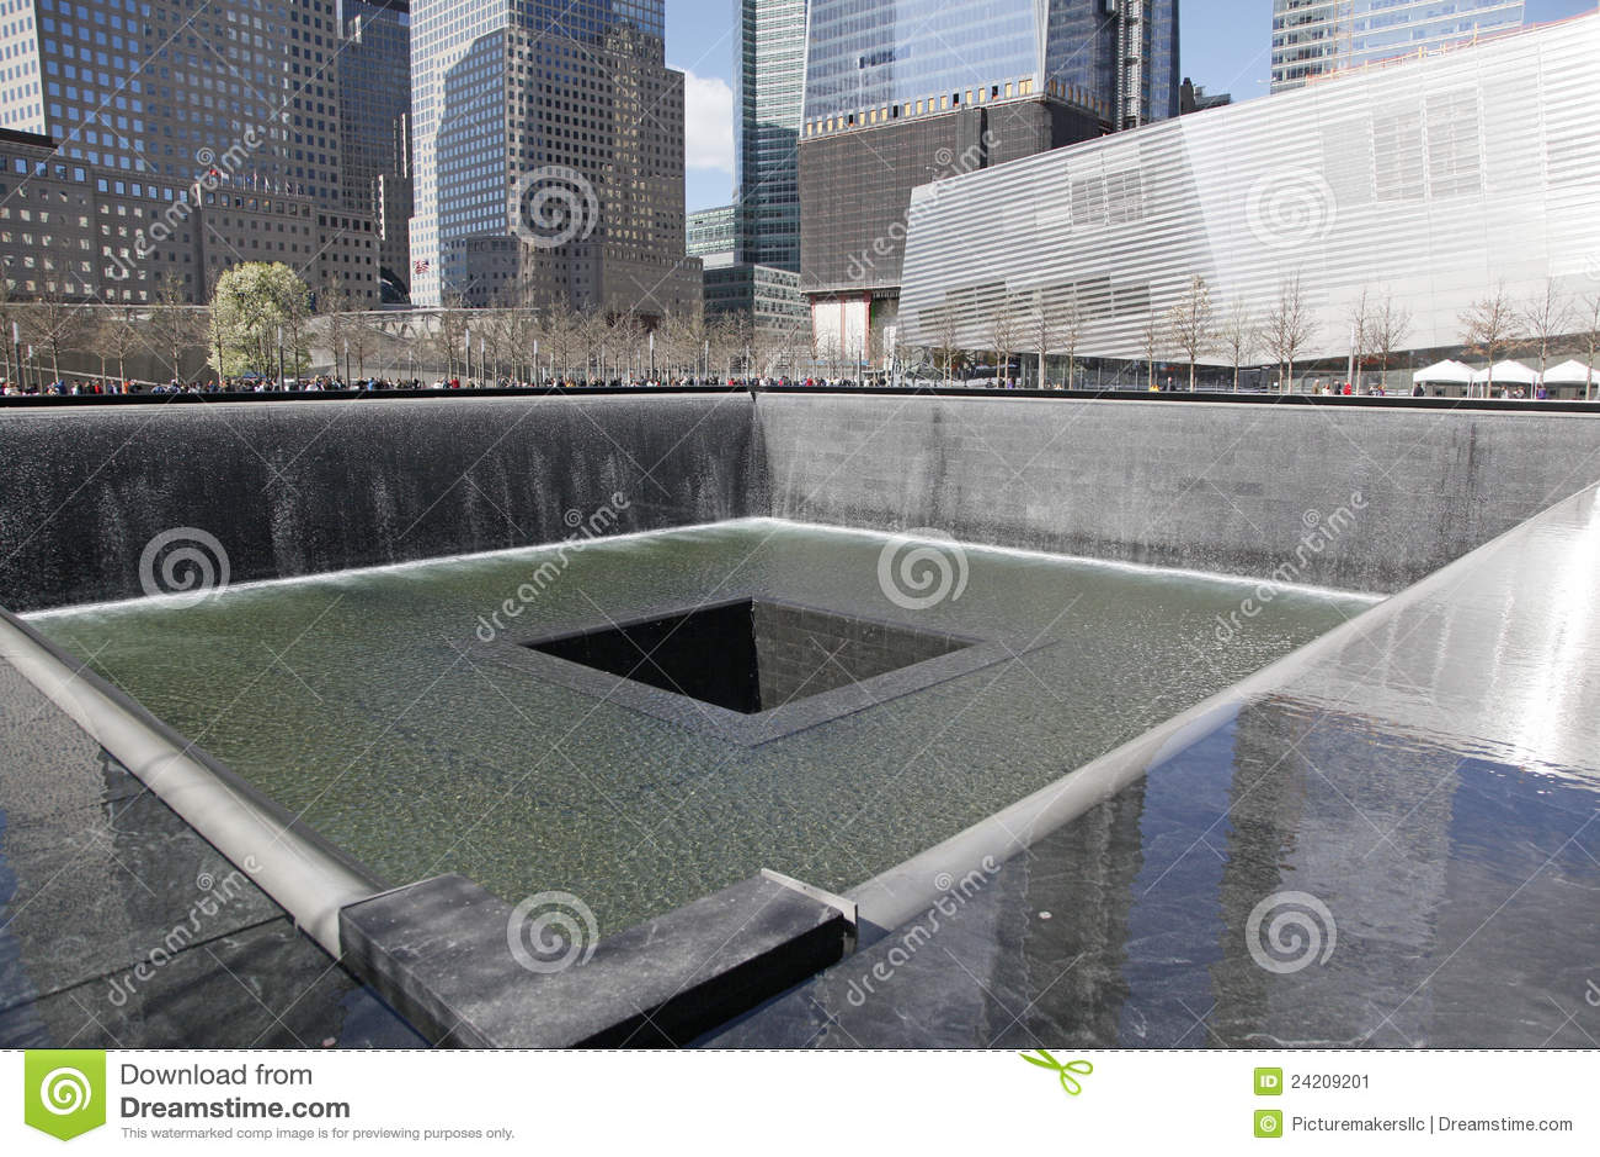 Ground zero freedom tower wtc editorial photo image - Ground zero pools ...